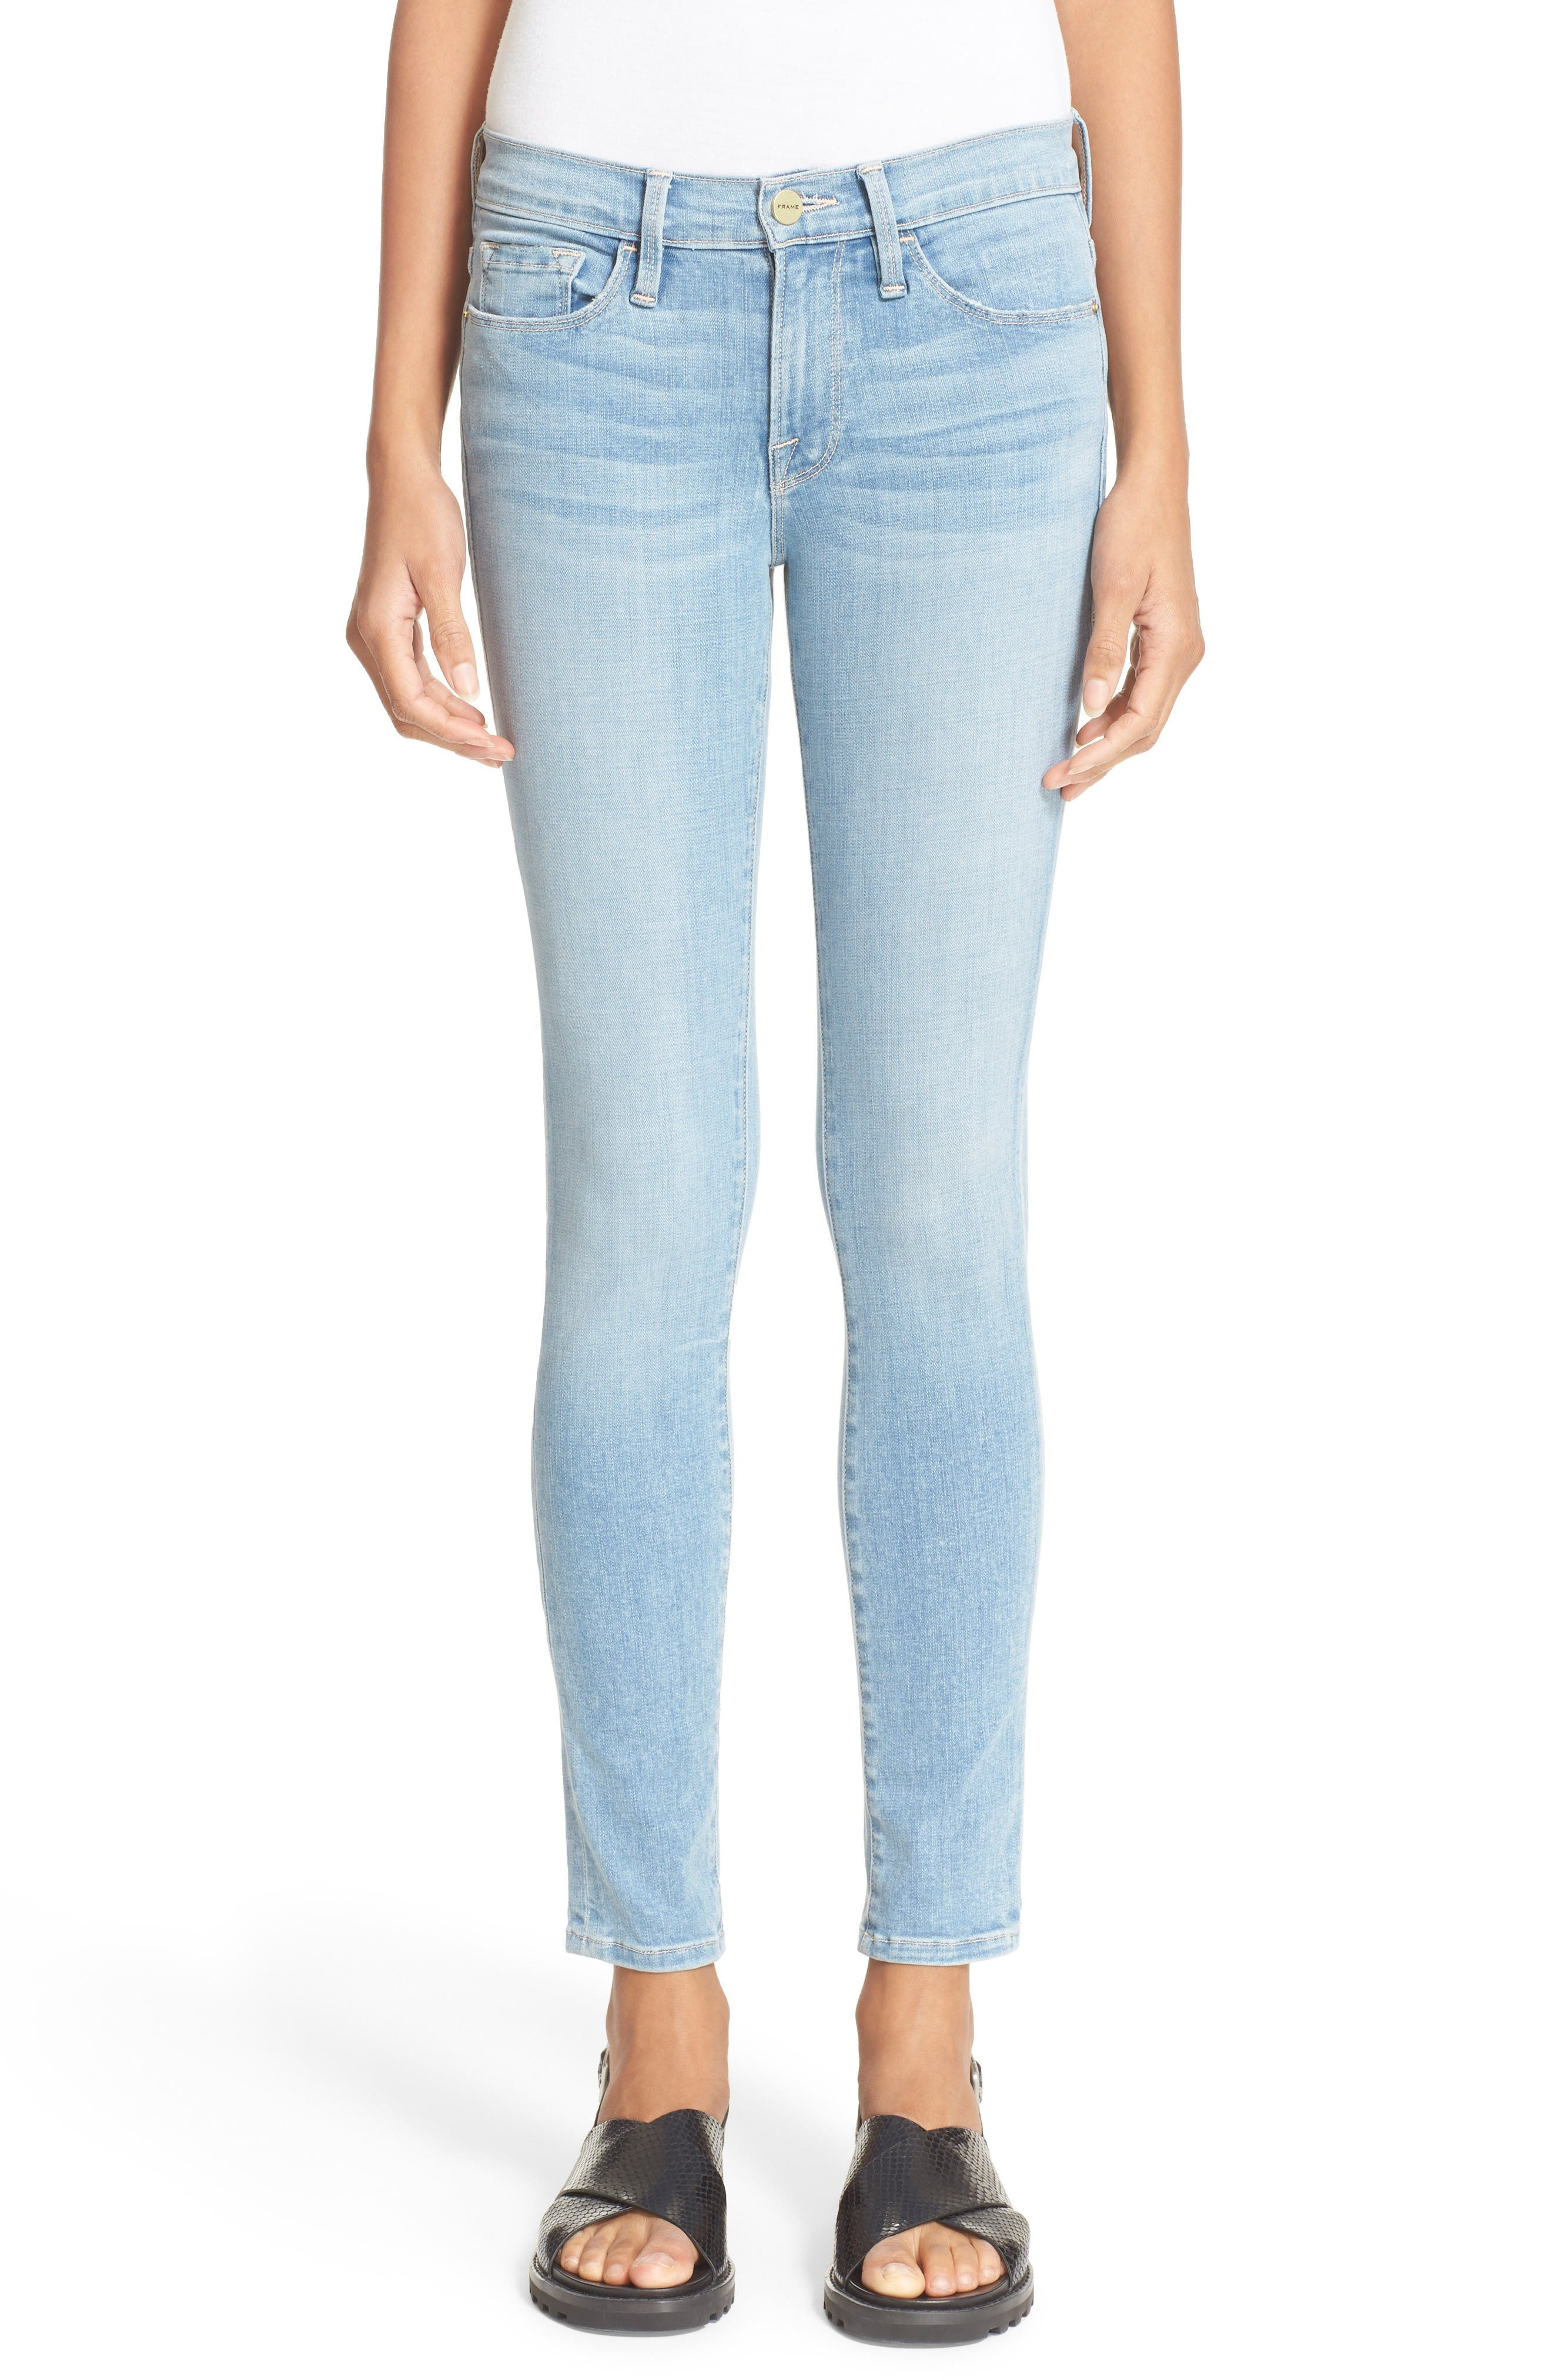 Alternate Image 1 Selected - FRAME 'Le Skinny de Jeanne' Jeans (Antibes)